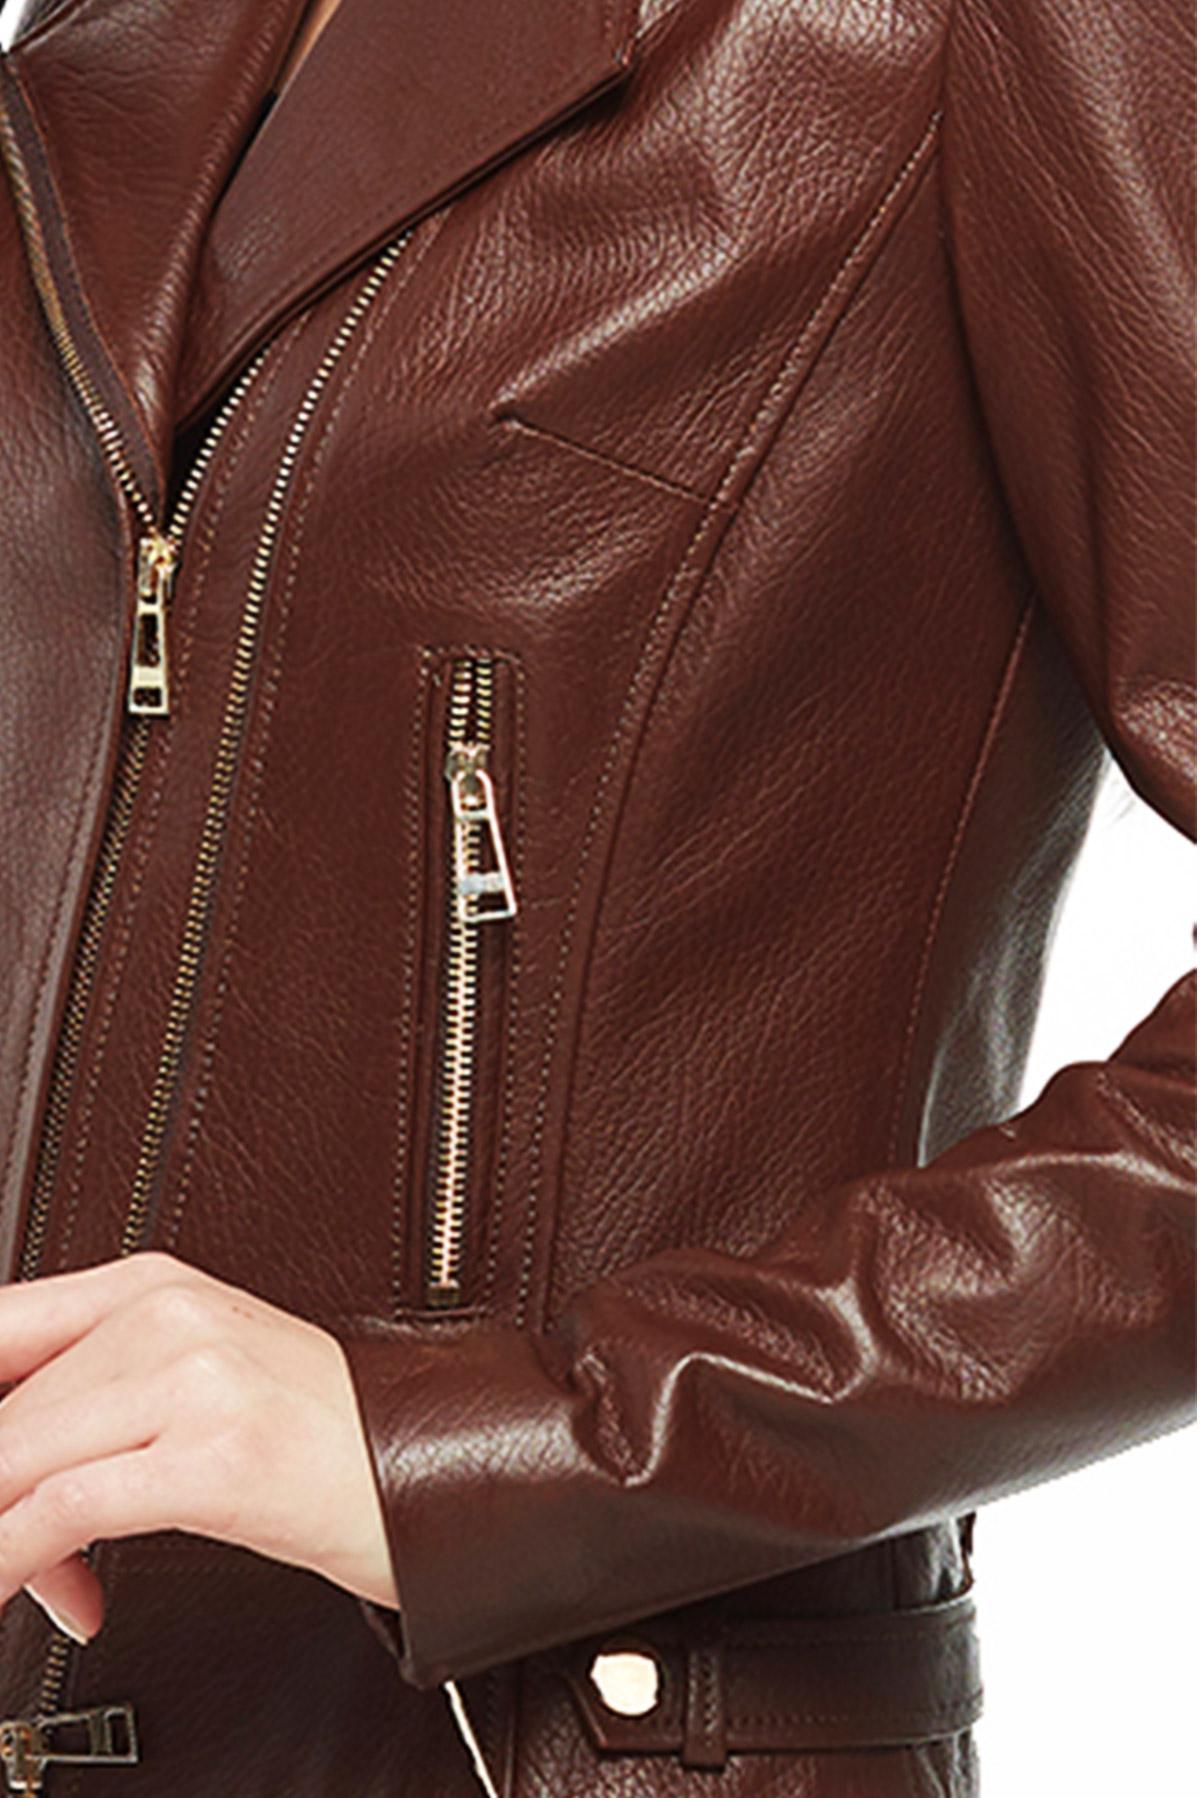 marimekko leather jackets for womens